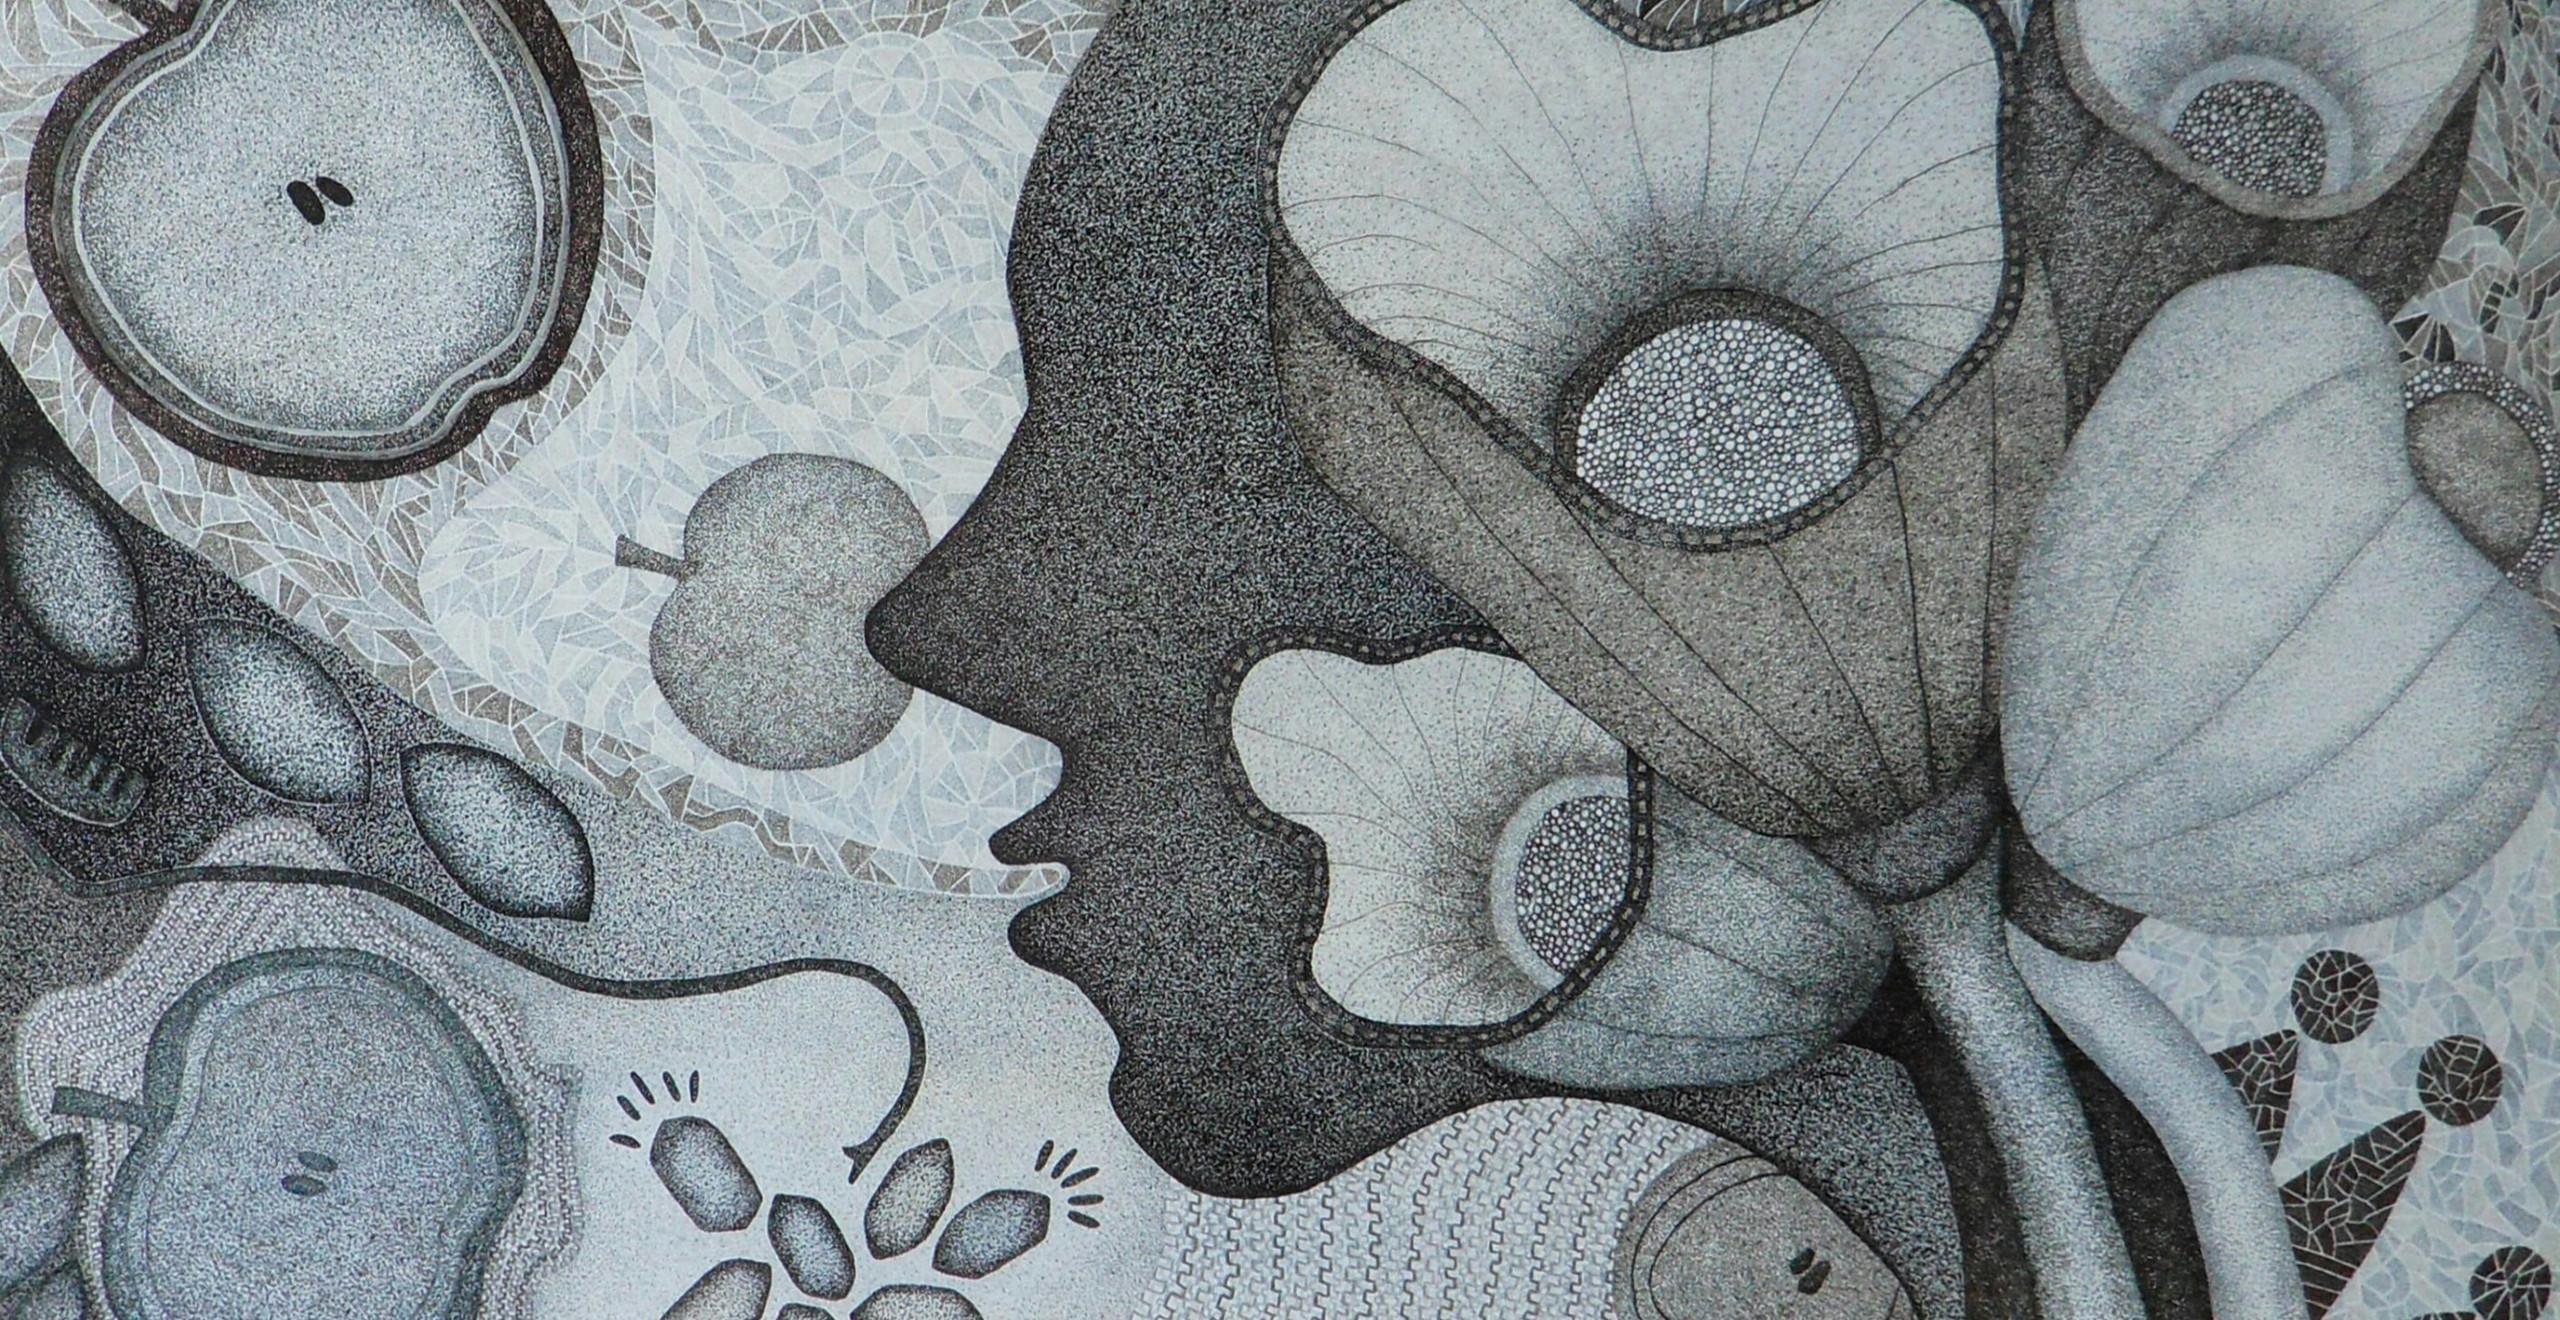 Kiss Flower (mixed media on canvas / 130.3×89.4)